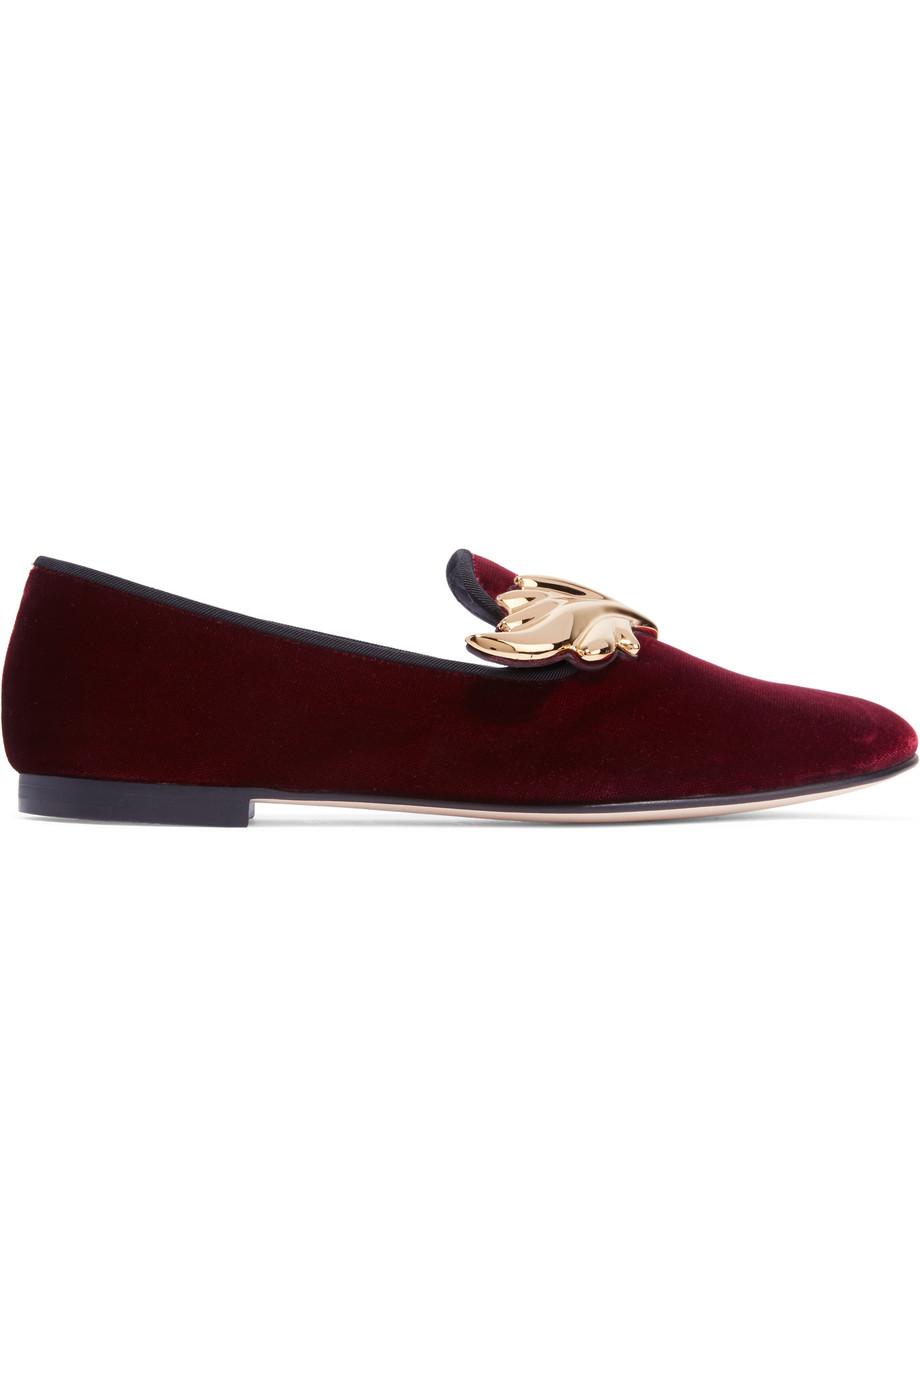 Giuseppe Zanotti Embellished Velvet Loafers, Burgundy, Women's US Size: 8, Size: 38.5